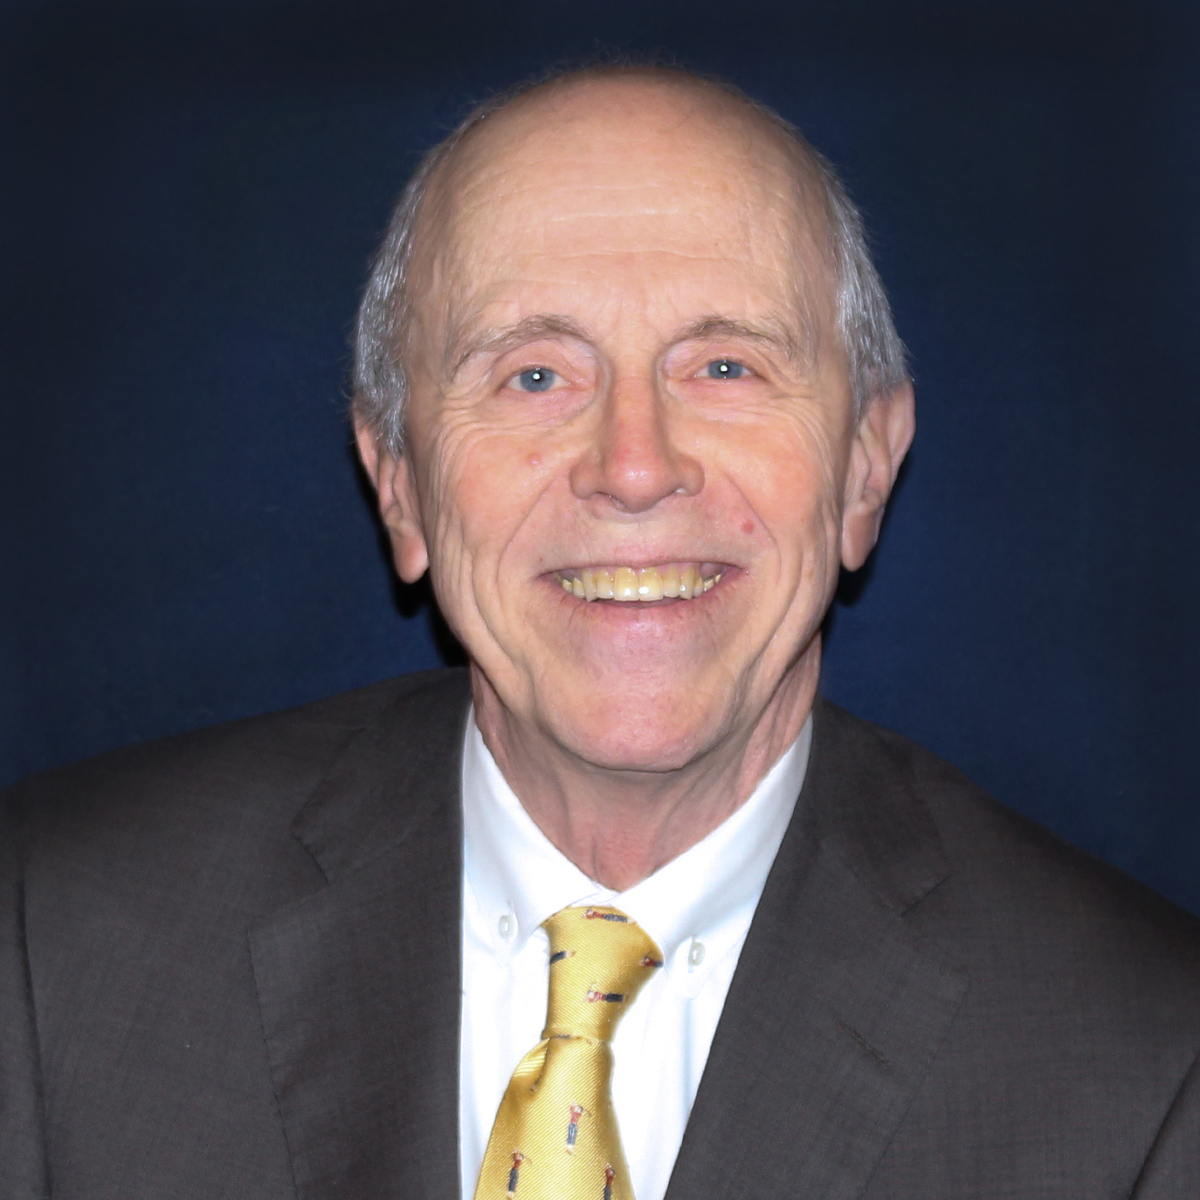 Kent R. Hance